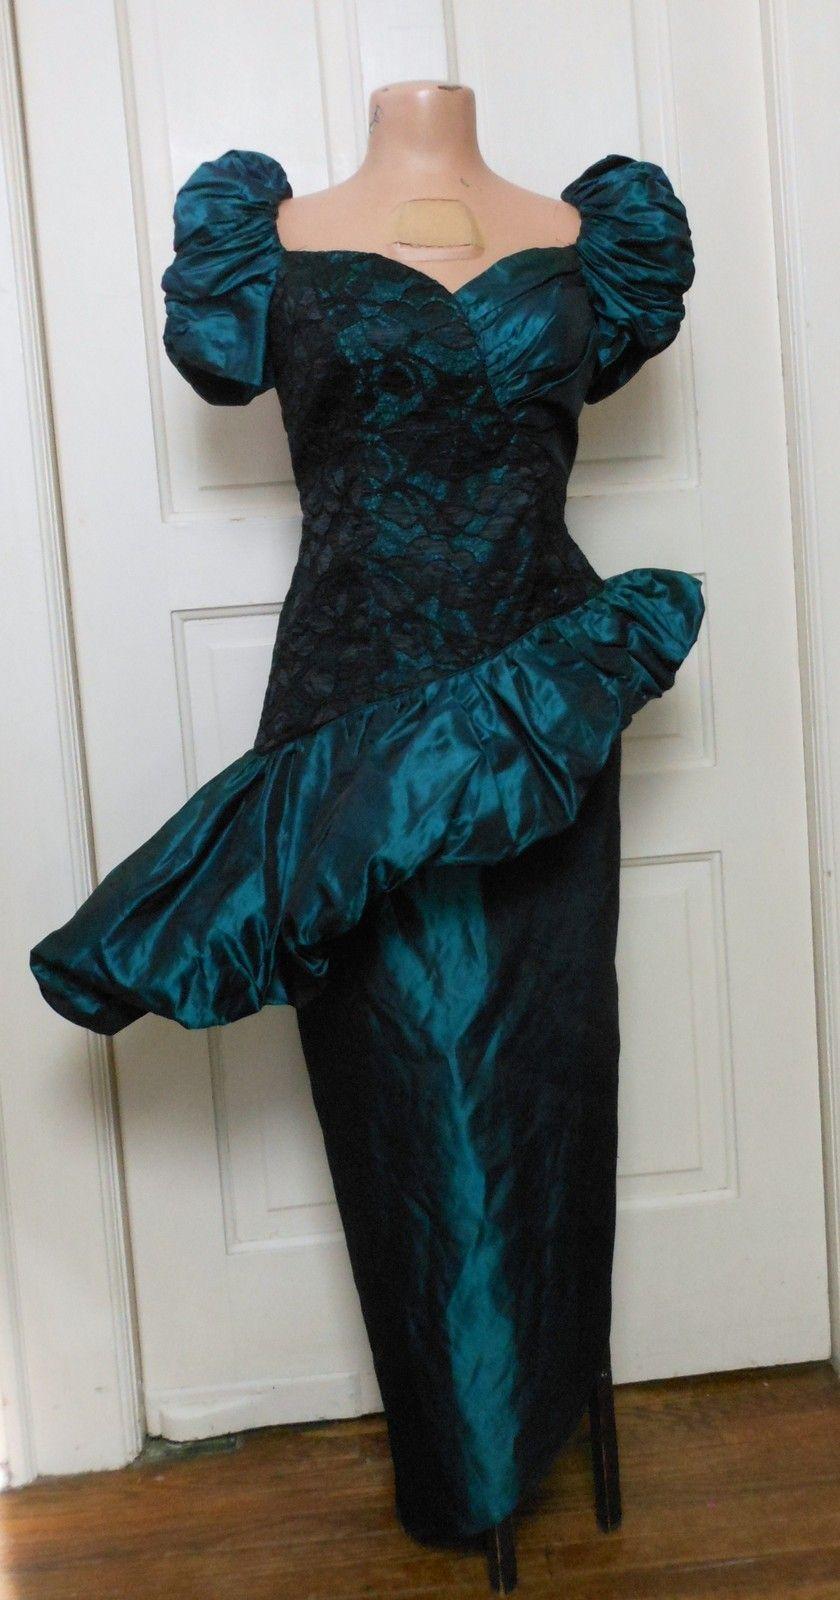 Vtg s peplum puff sleeve green black lace avant garde pencil prom